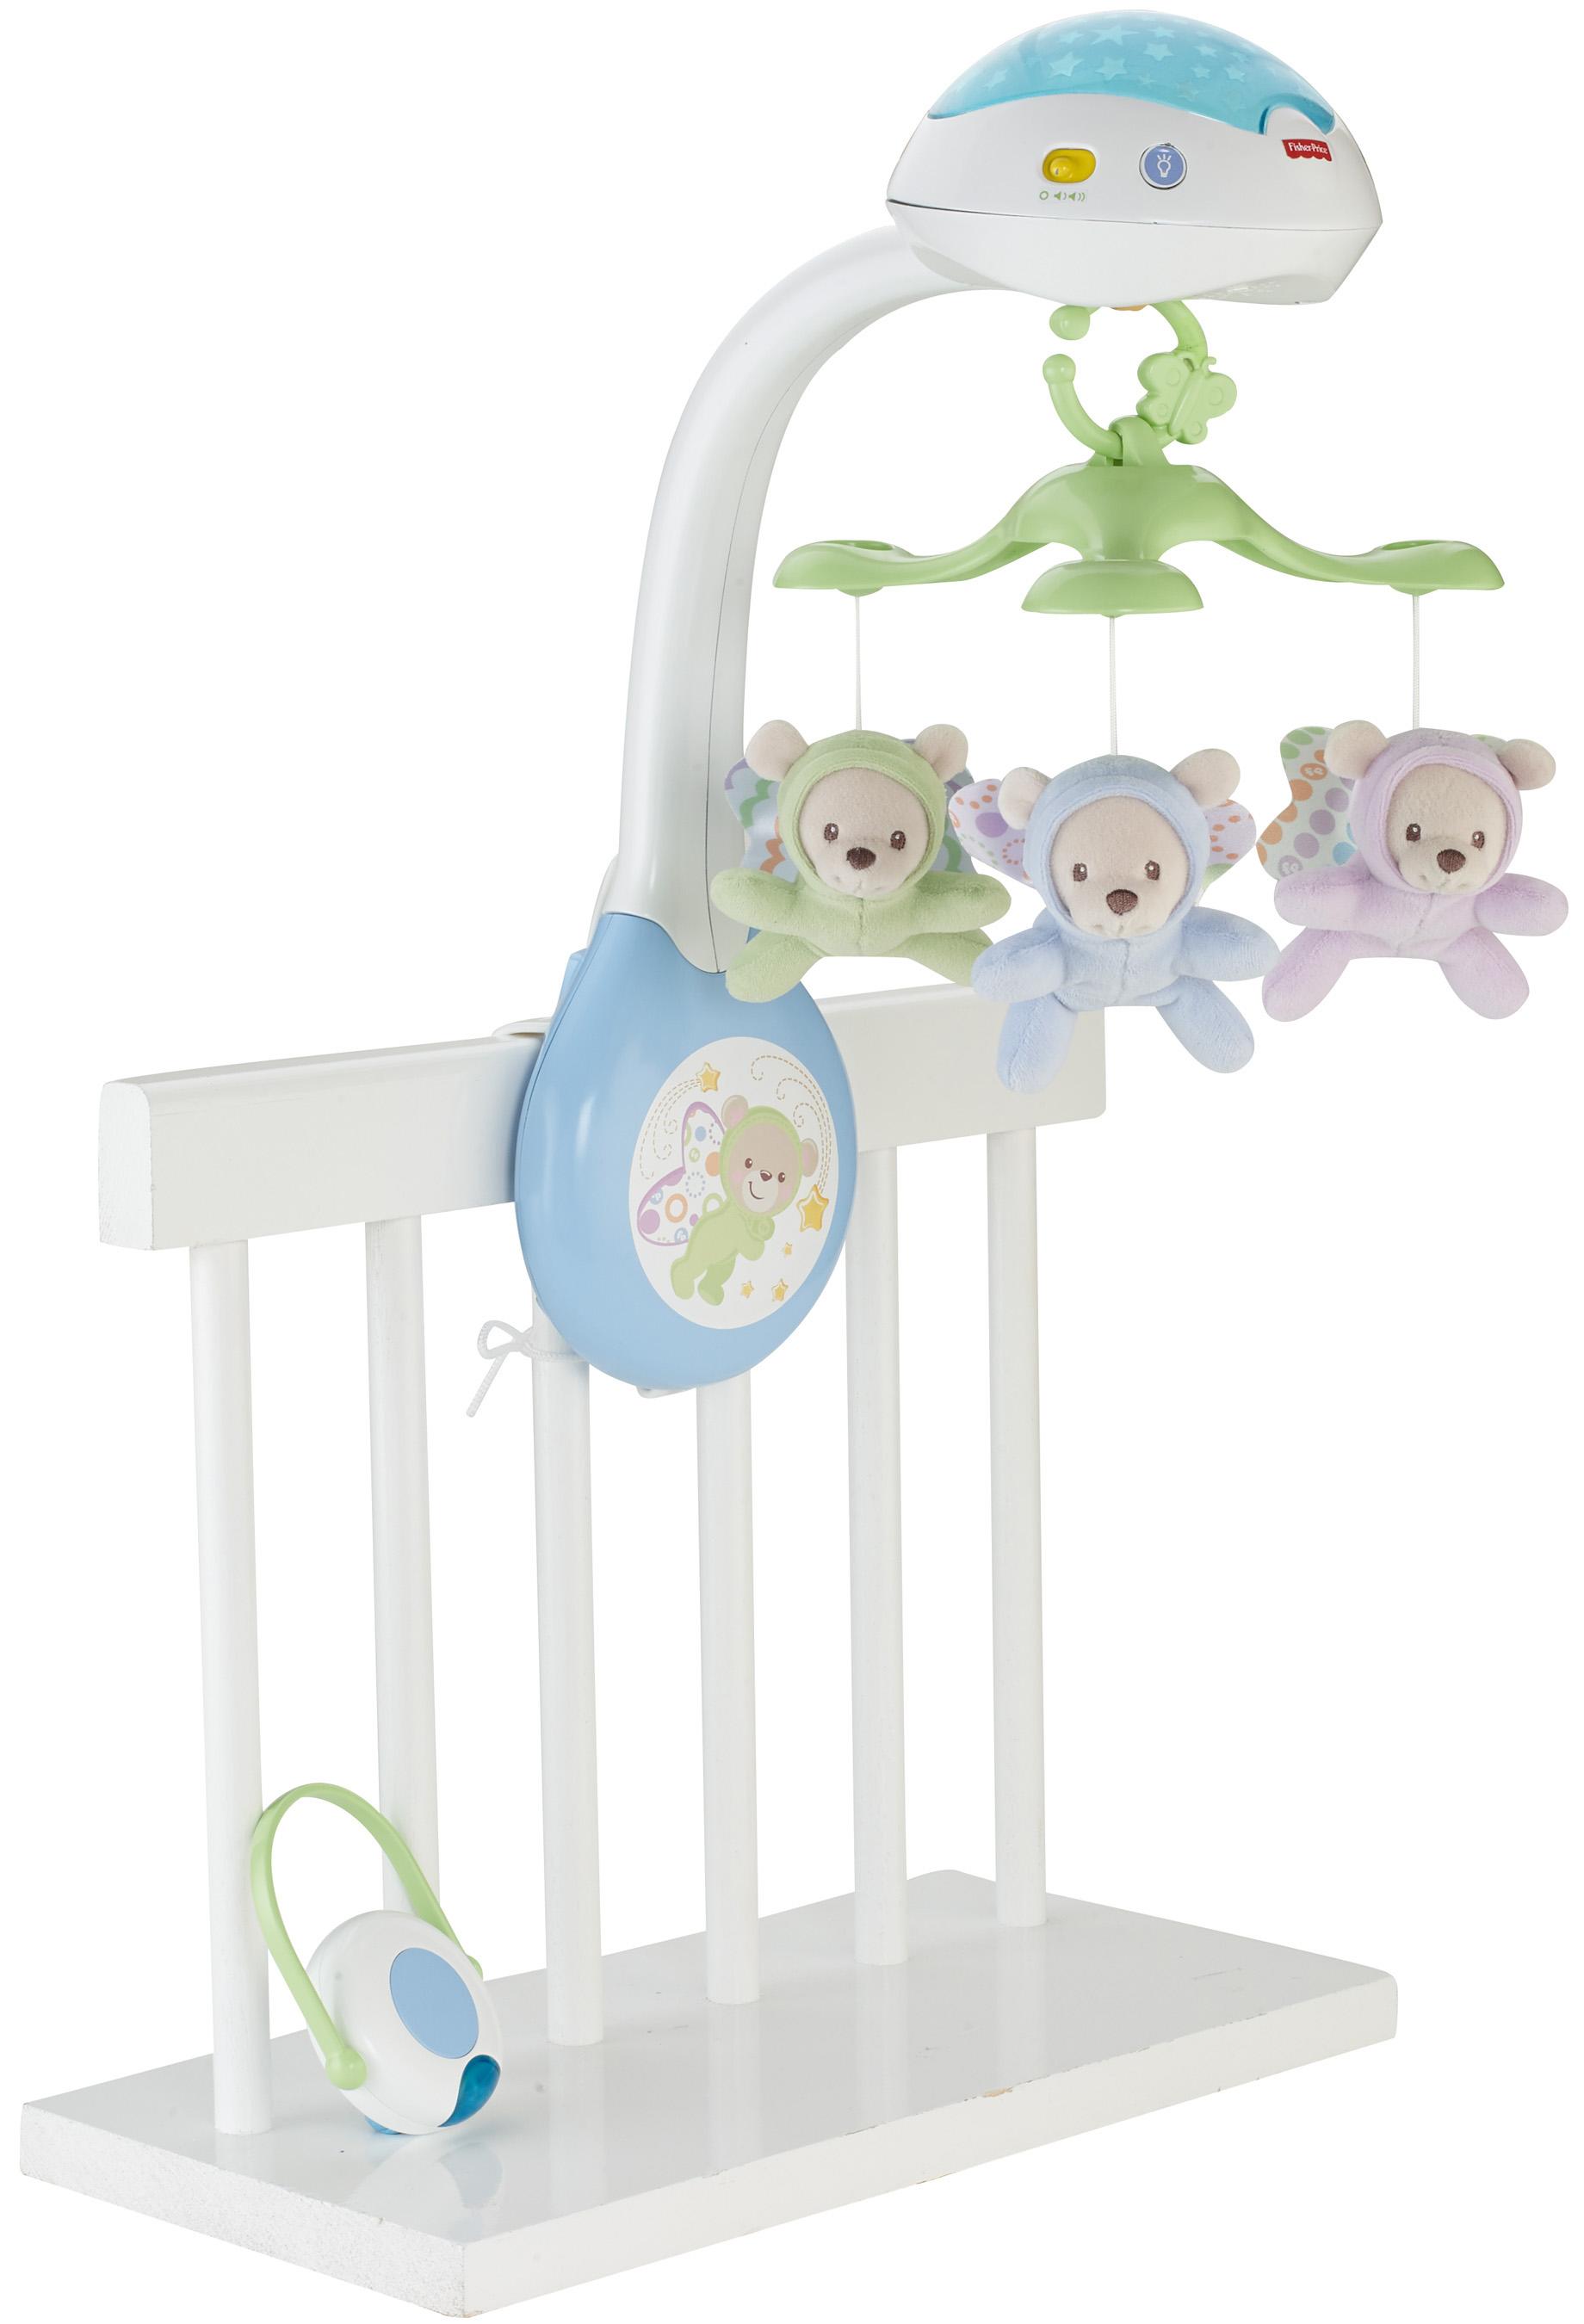 Мобили для малышей Fisher Price Мечты  бабочках